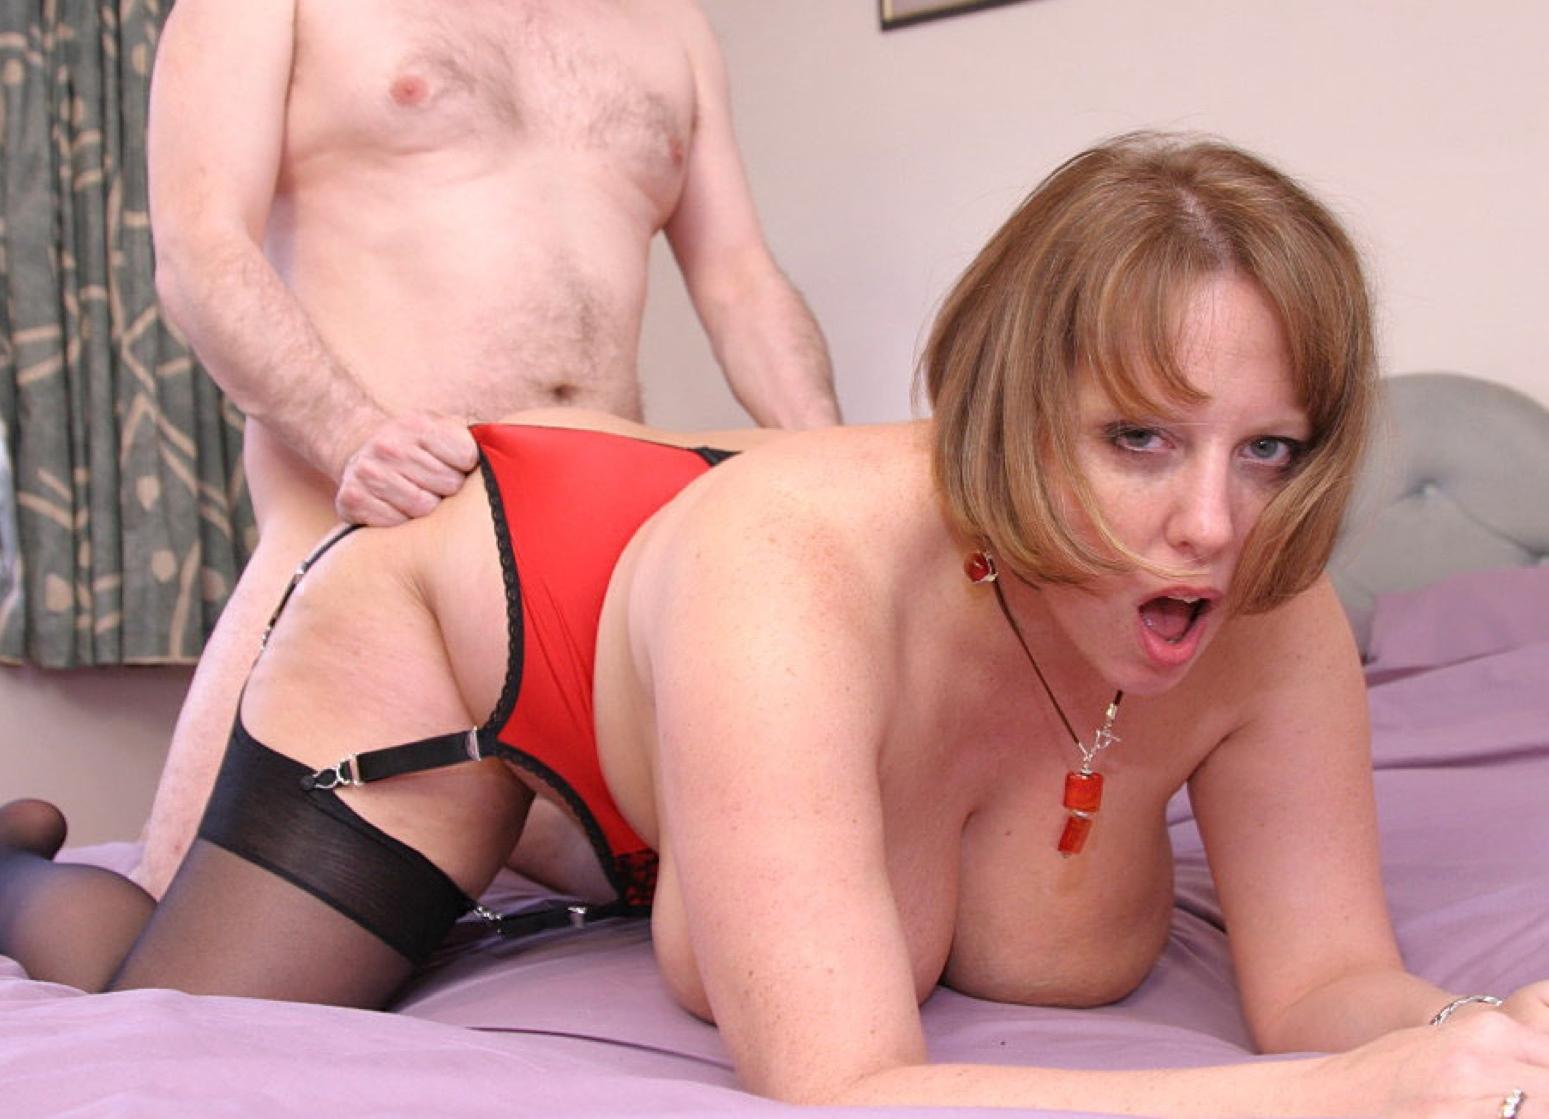 oral sex porn cougar escort uk